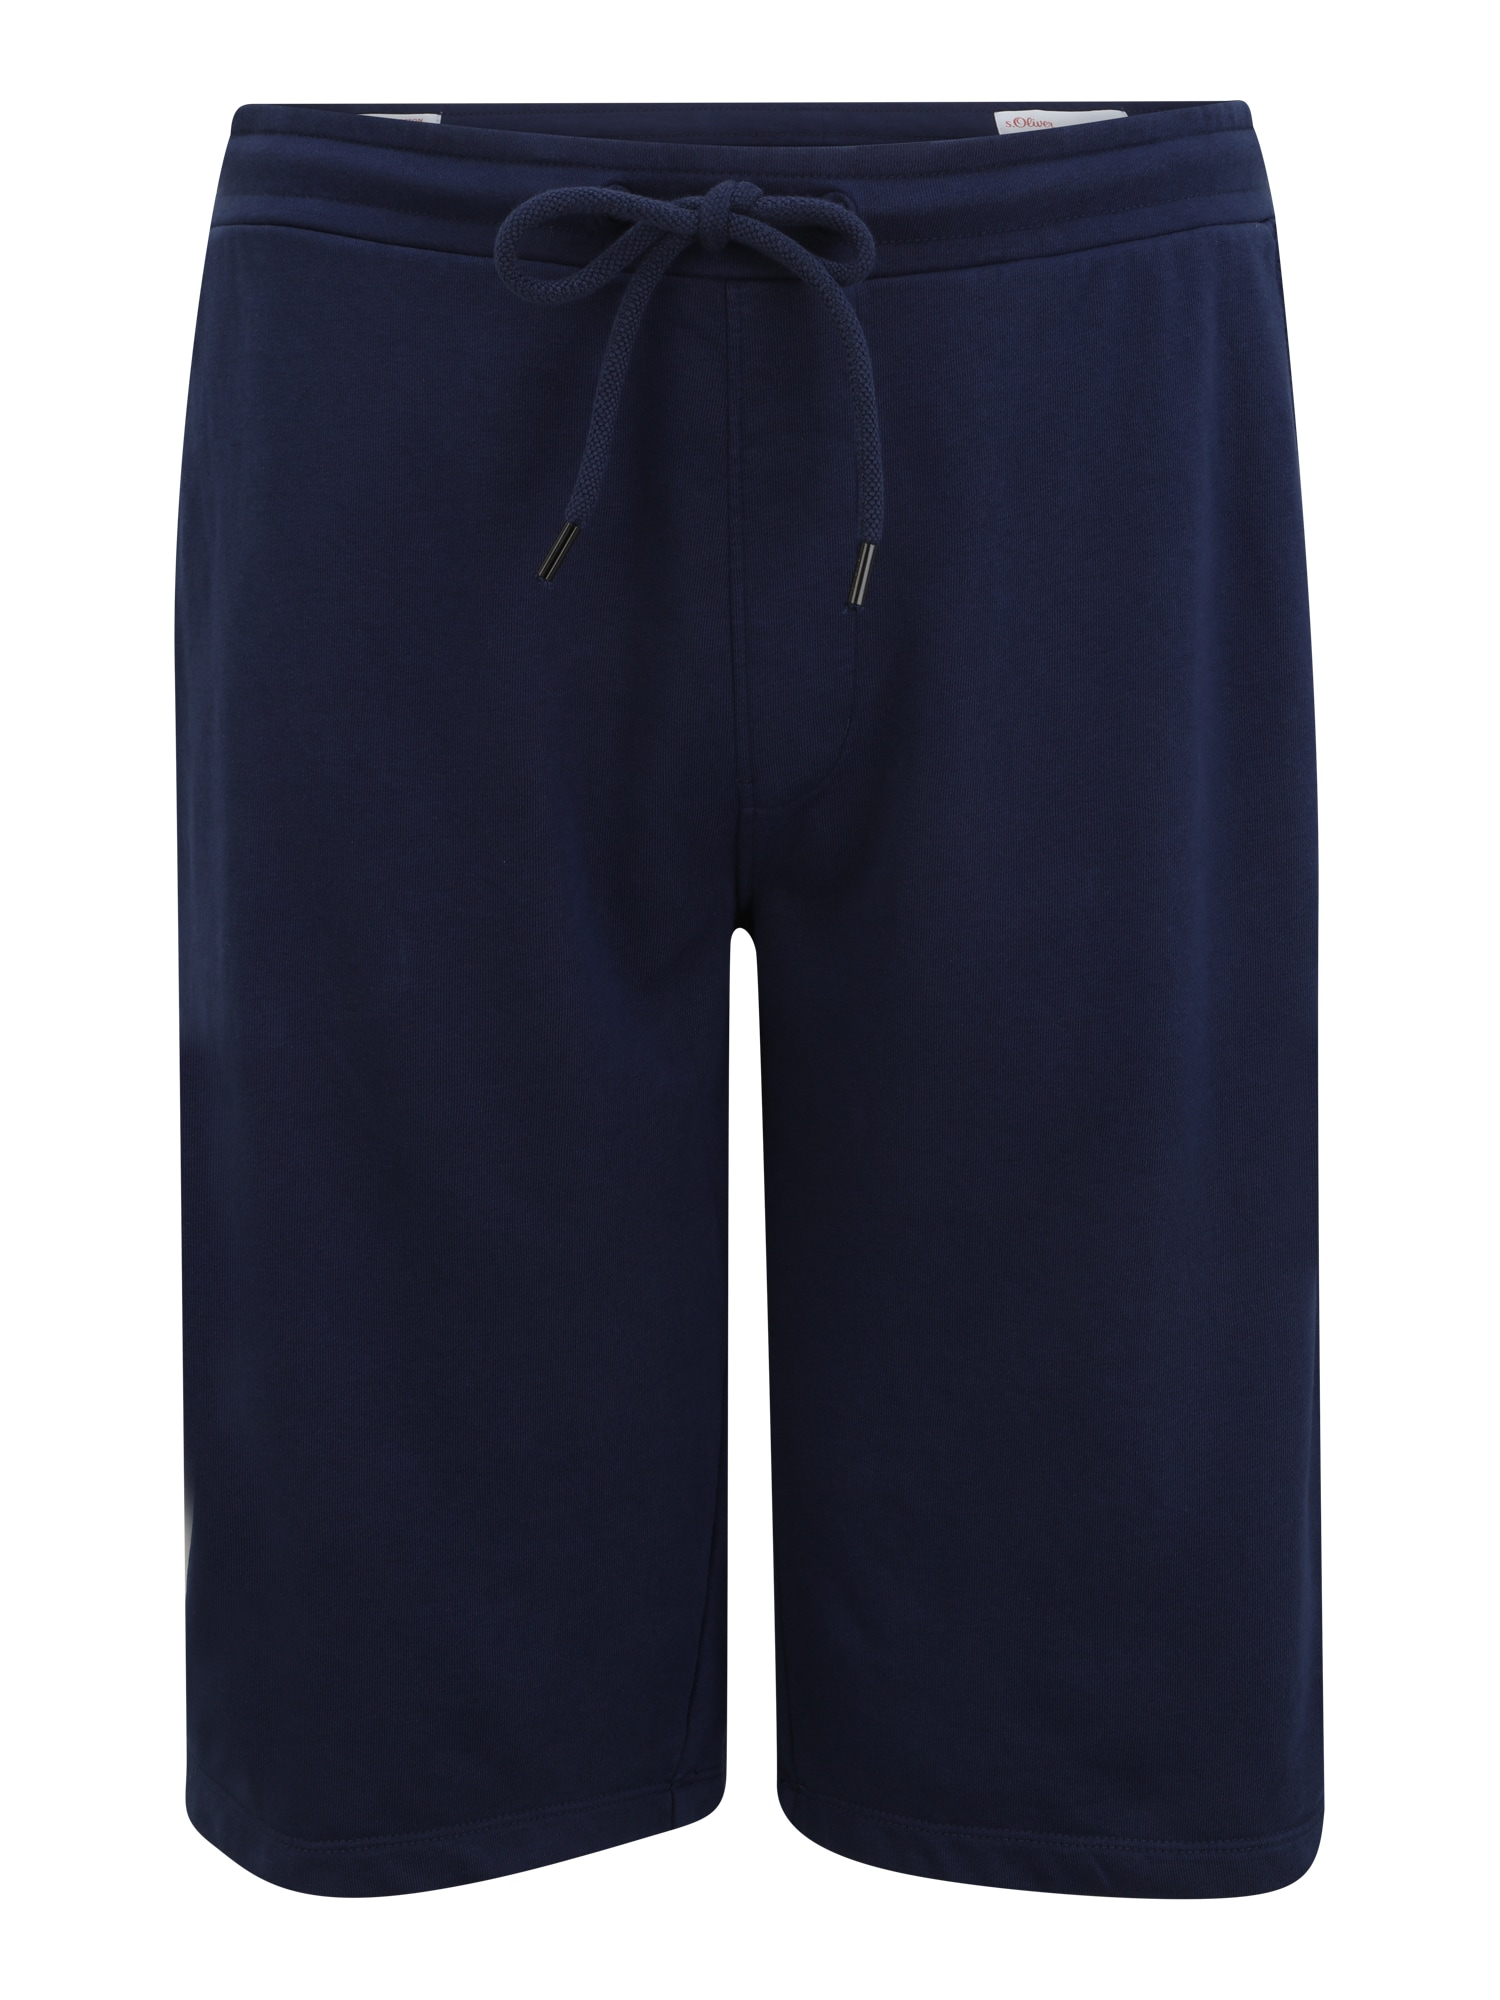 s.Oliver Red Label Big & Tall Kelnės tamsiai mėlyna jūros spalva